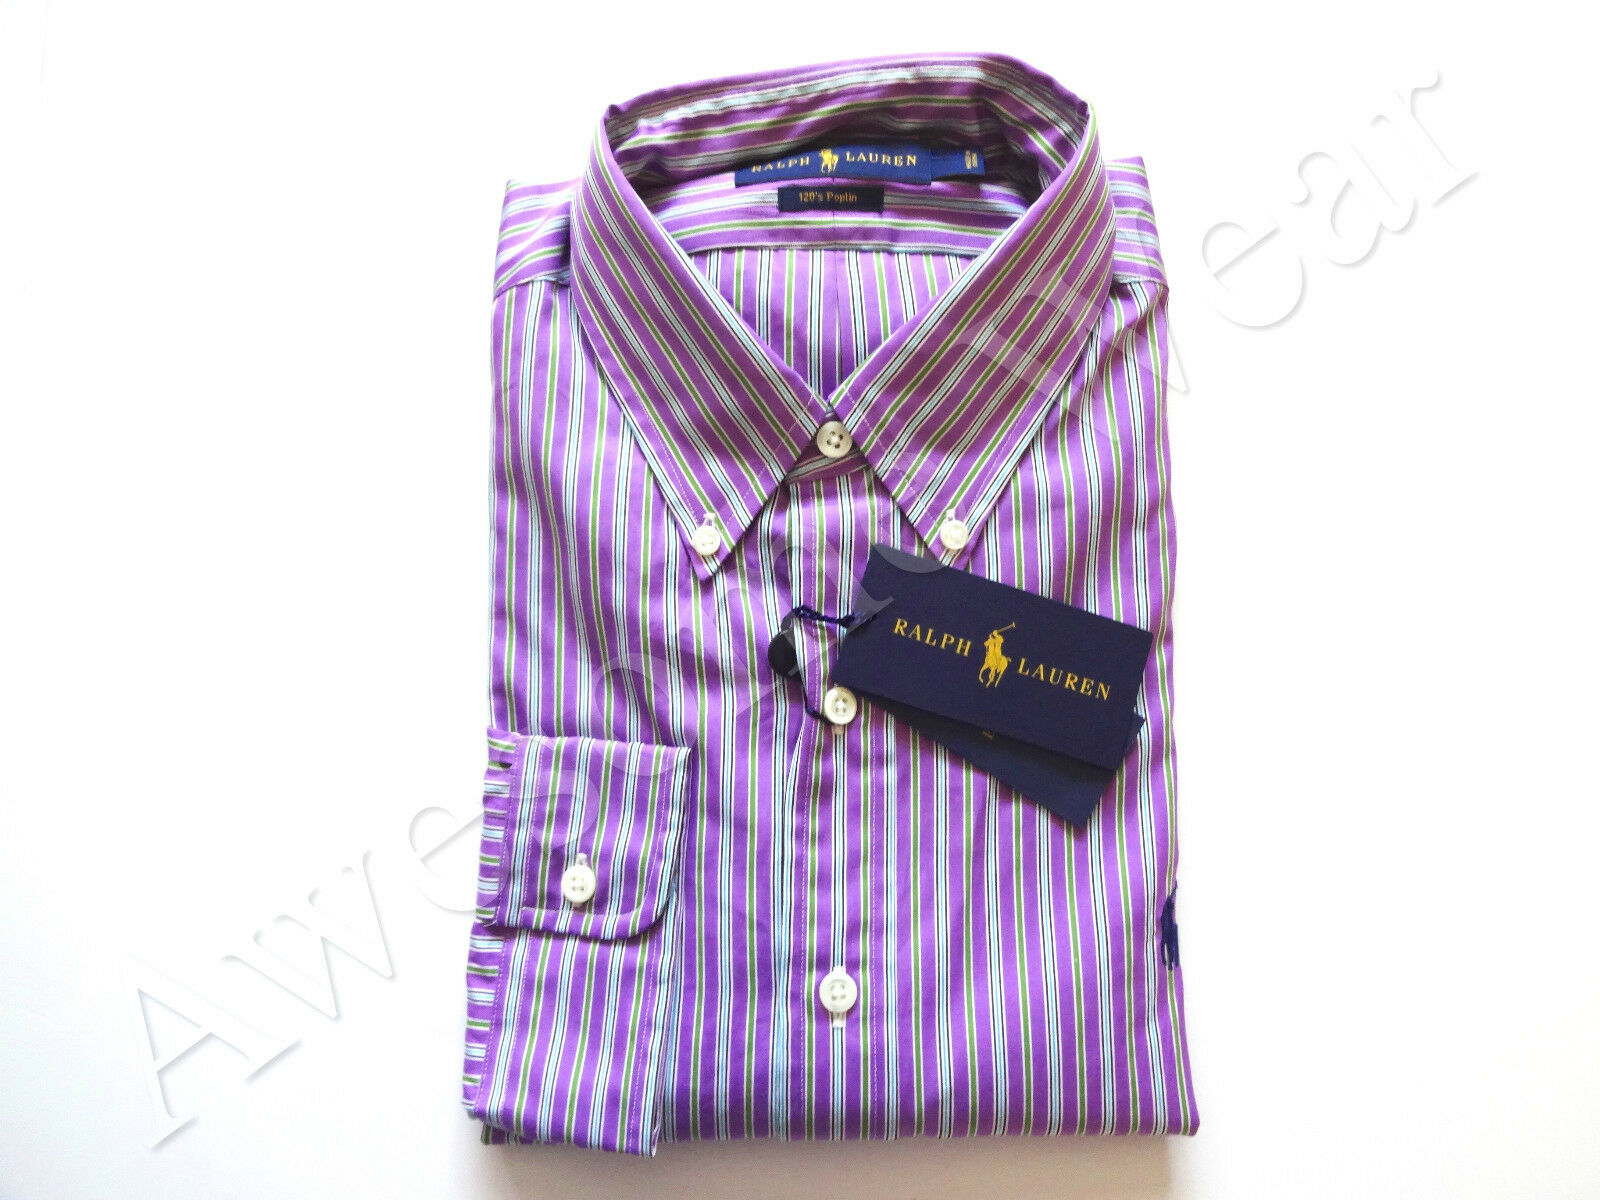 New Ralph Lauren Polo Purple Poplin Striped 100% Cotton Button Up Shirt sz S